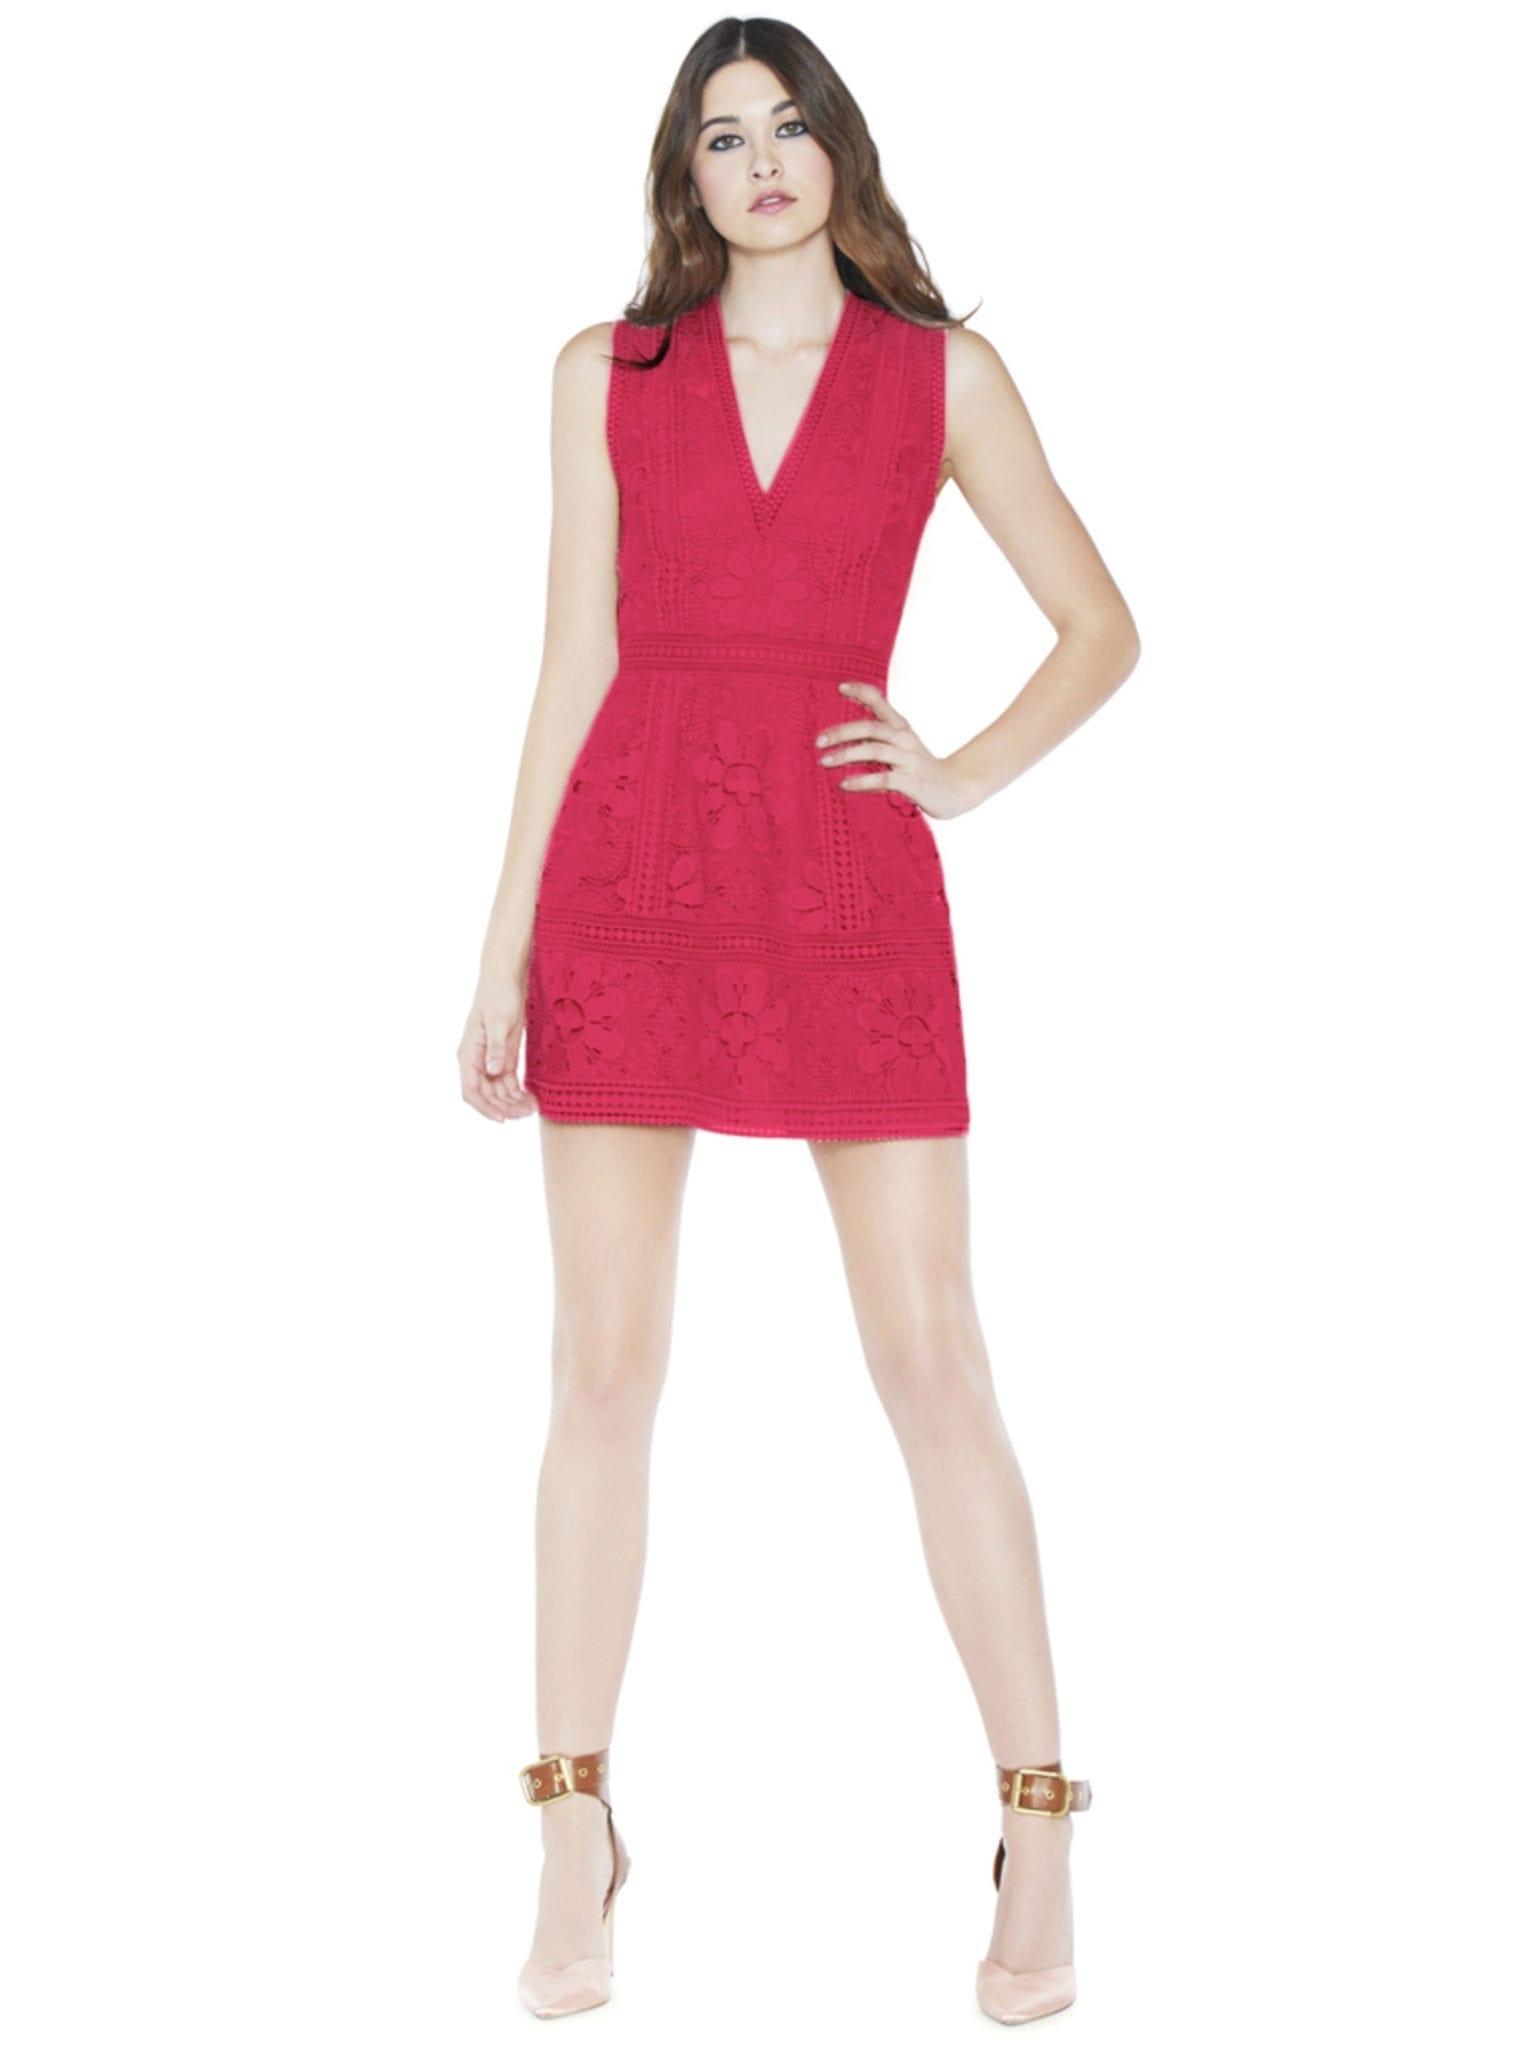 5567fc81000c Alice + Olivia Zula Lace V Neck Mini Ruby Dress - We Select Dresses